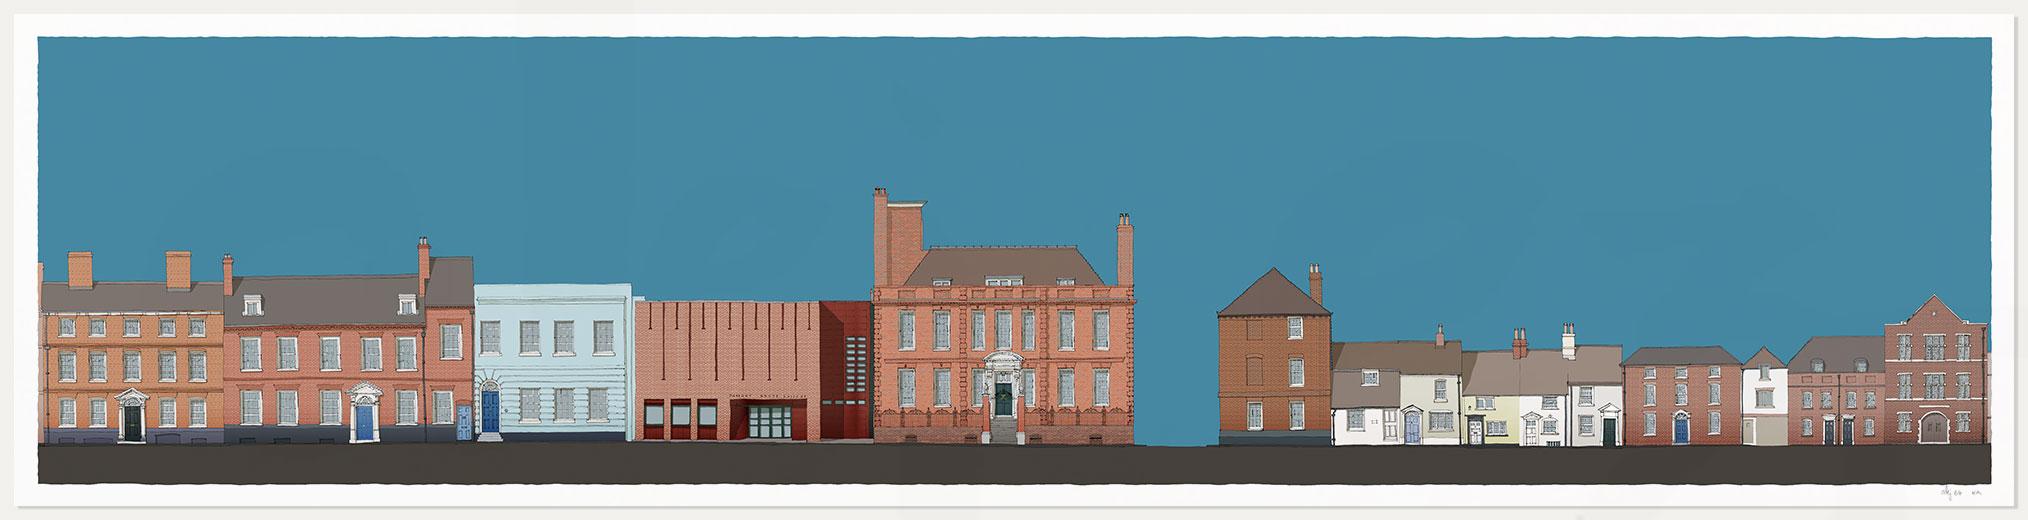 print named Pallant House Gallery Cerulean Blue by artist alej ez